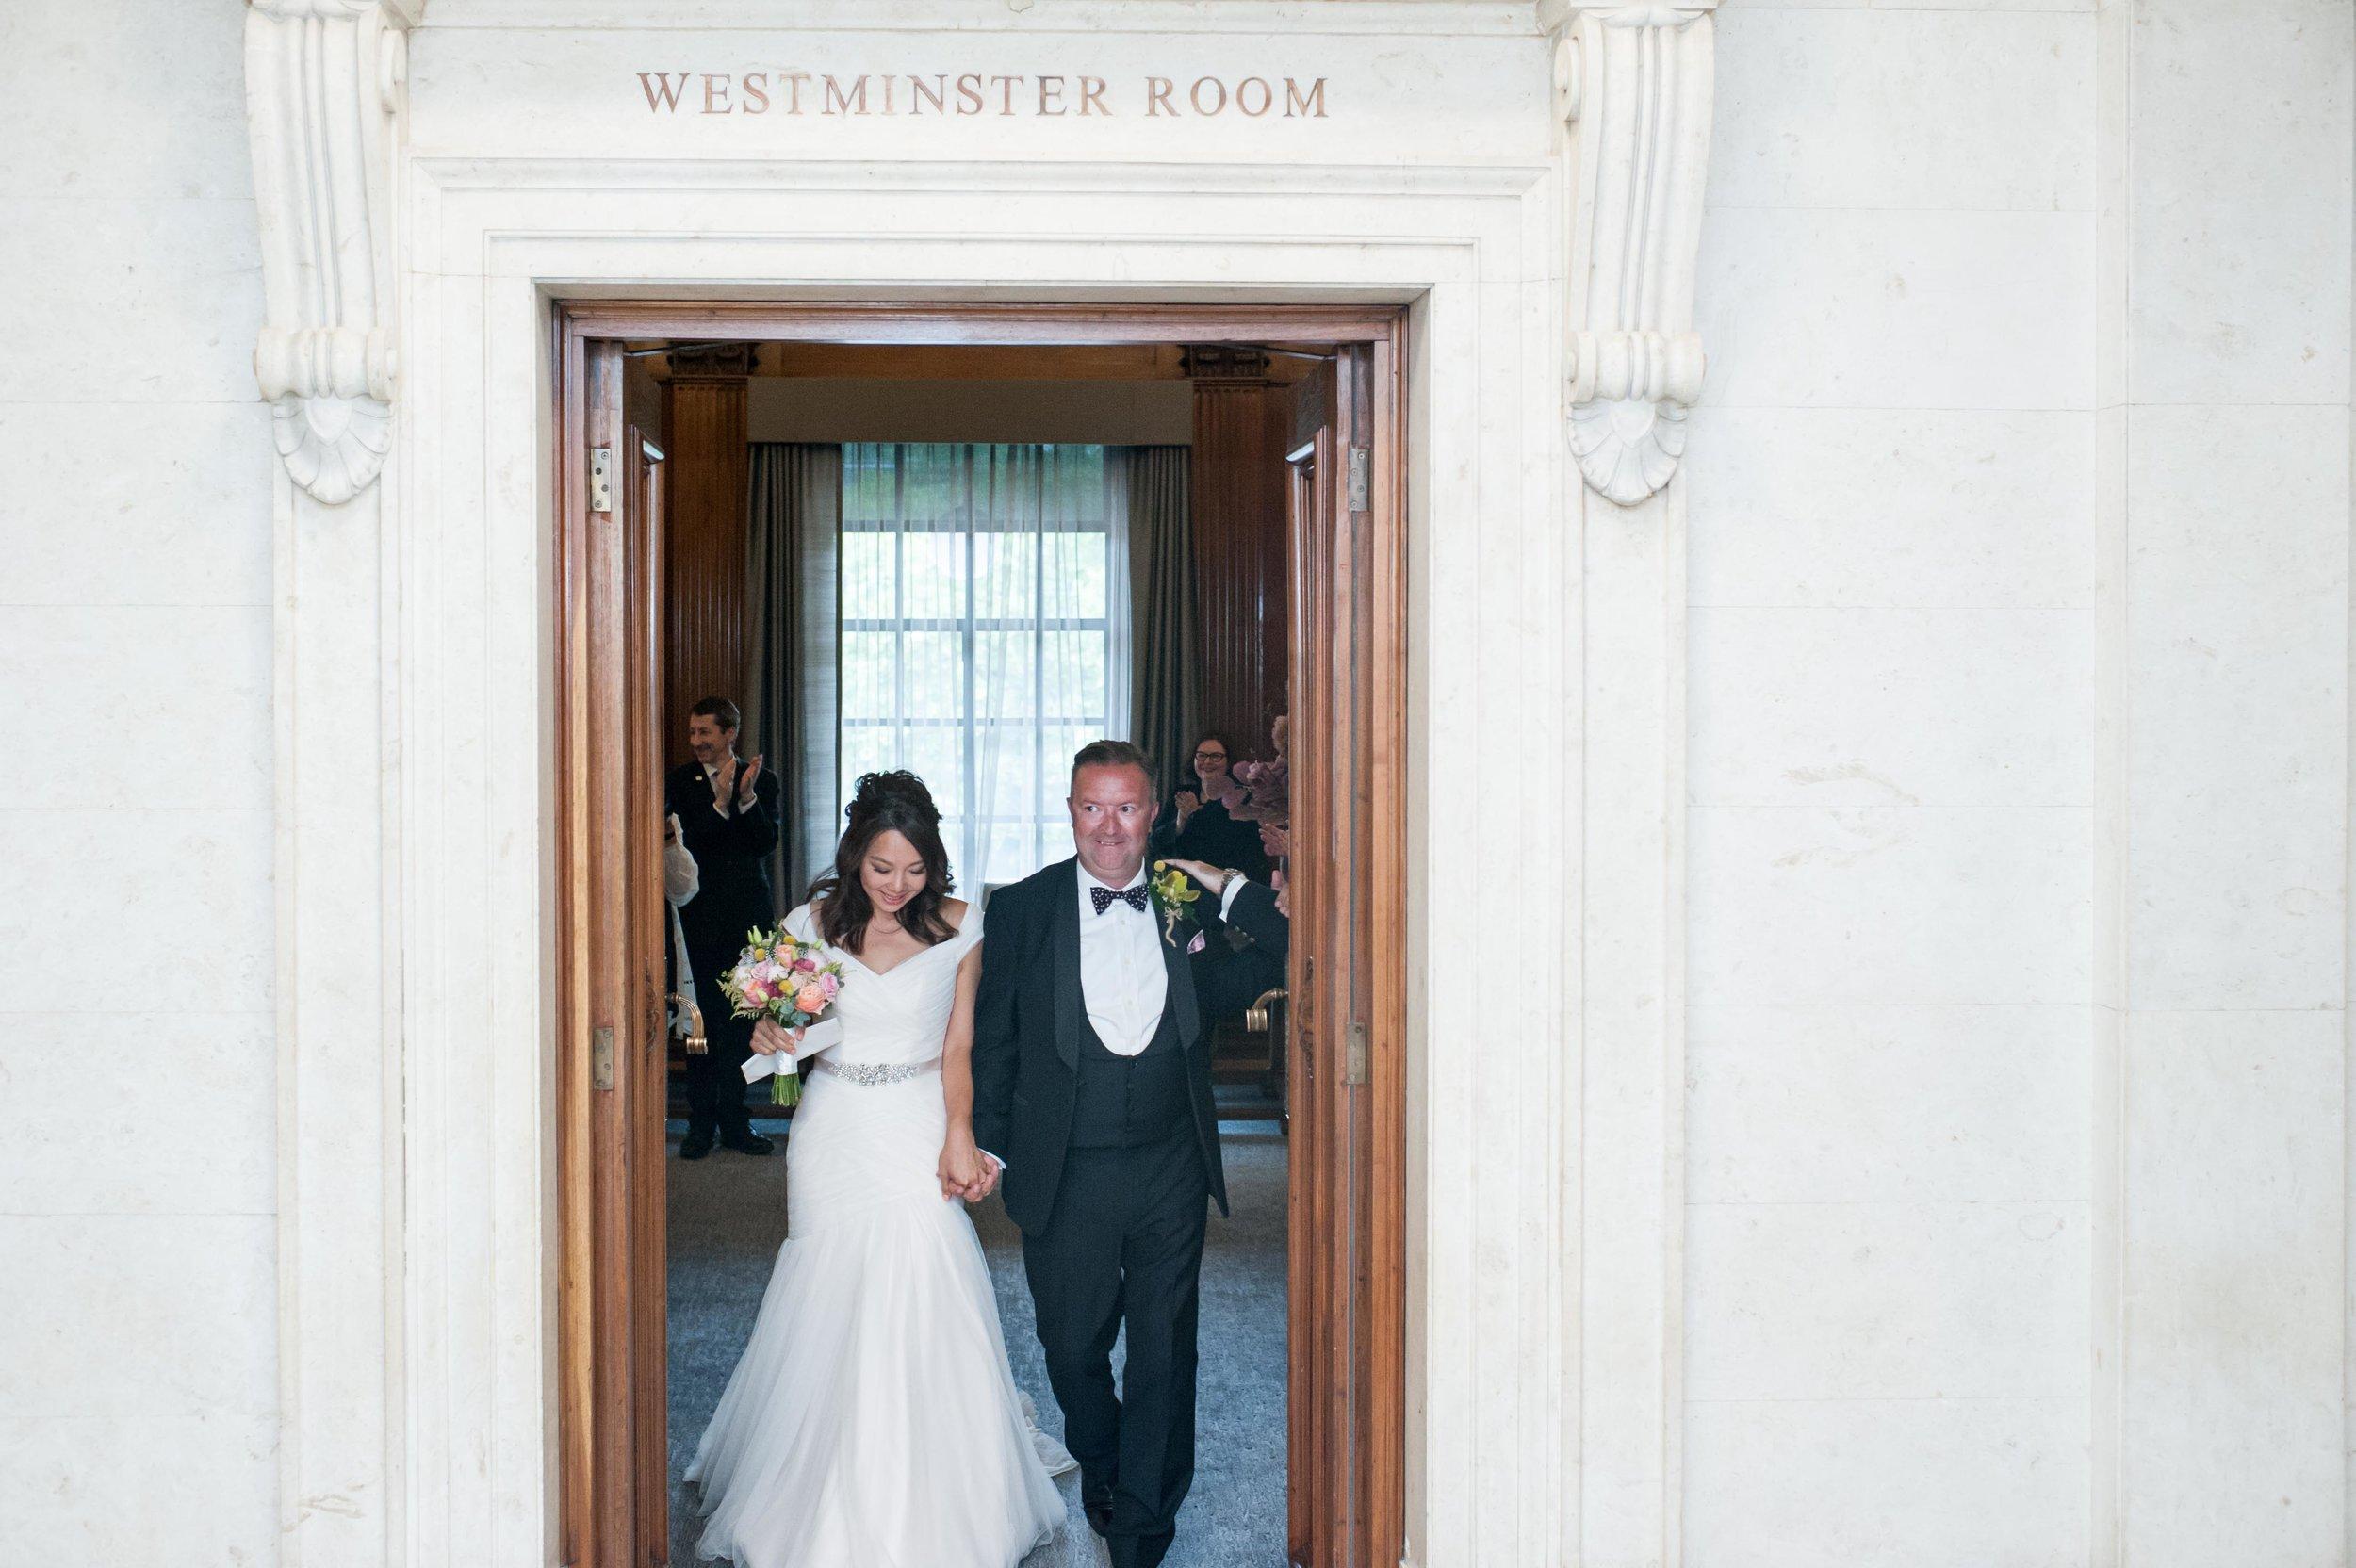 D&M_Marylebone Town Hall Wedding (117 of 239).jpg